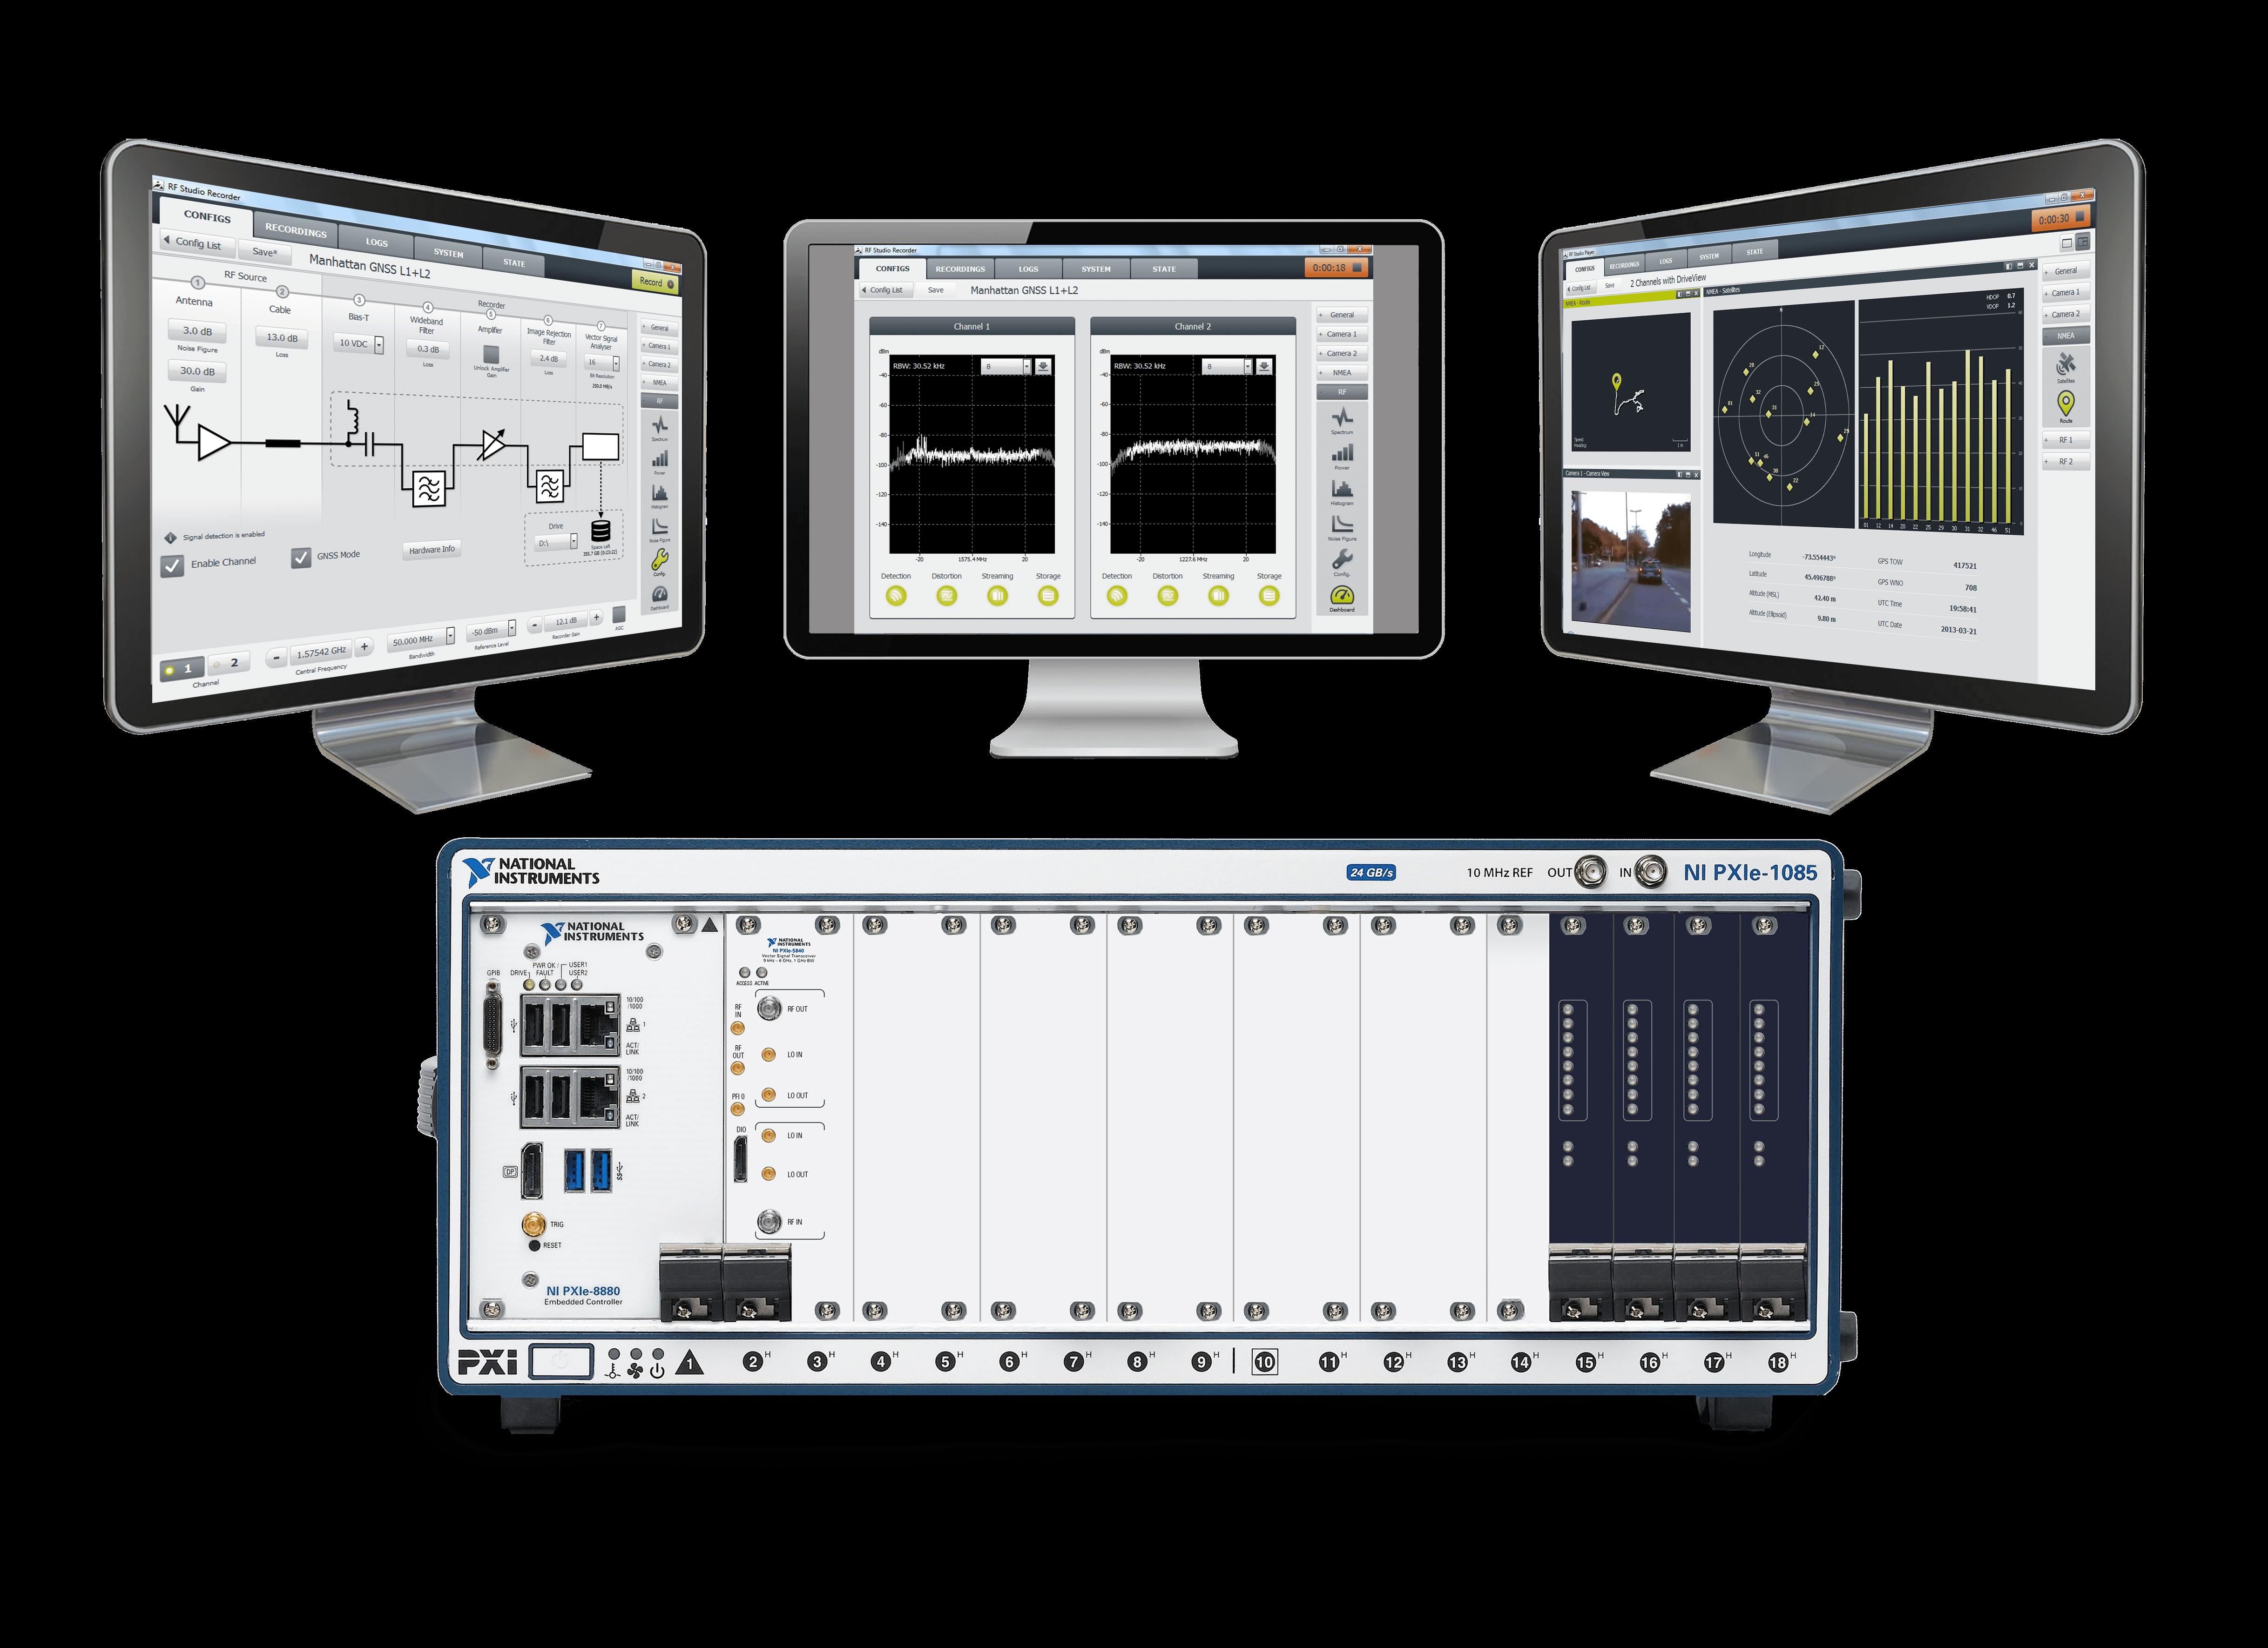 RP 6500 FrontScreen